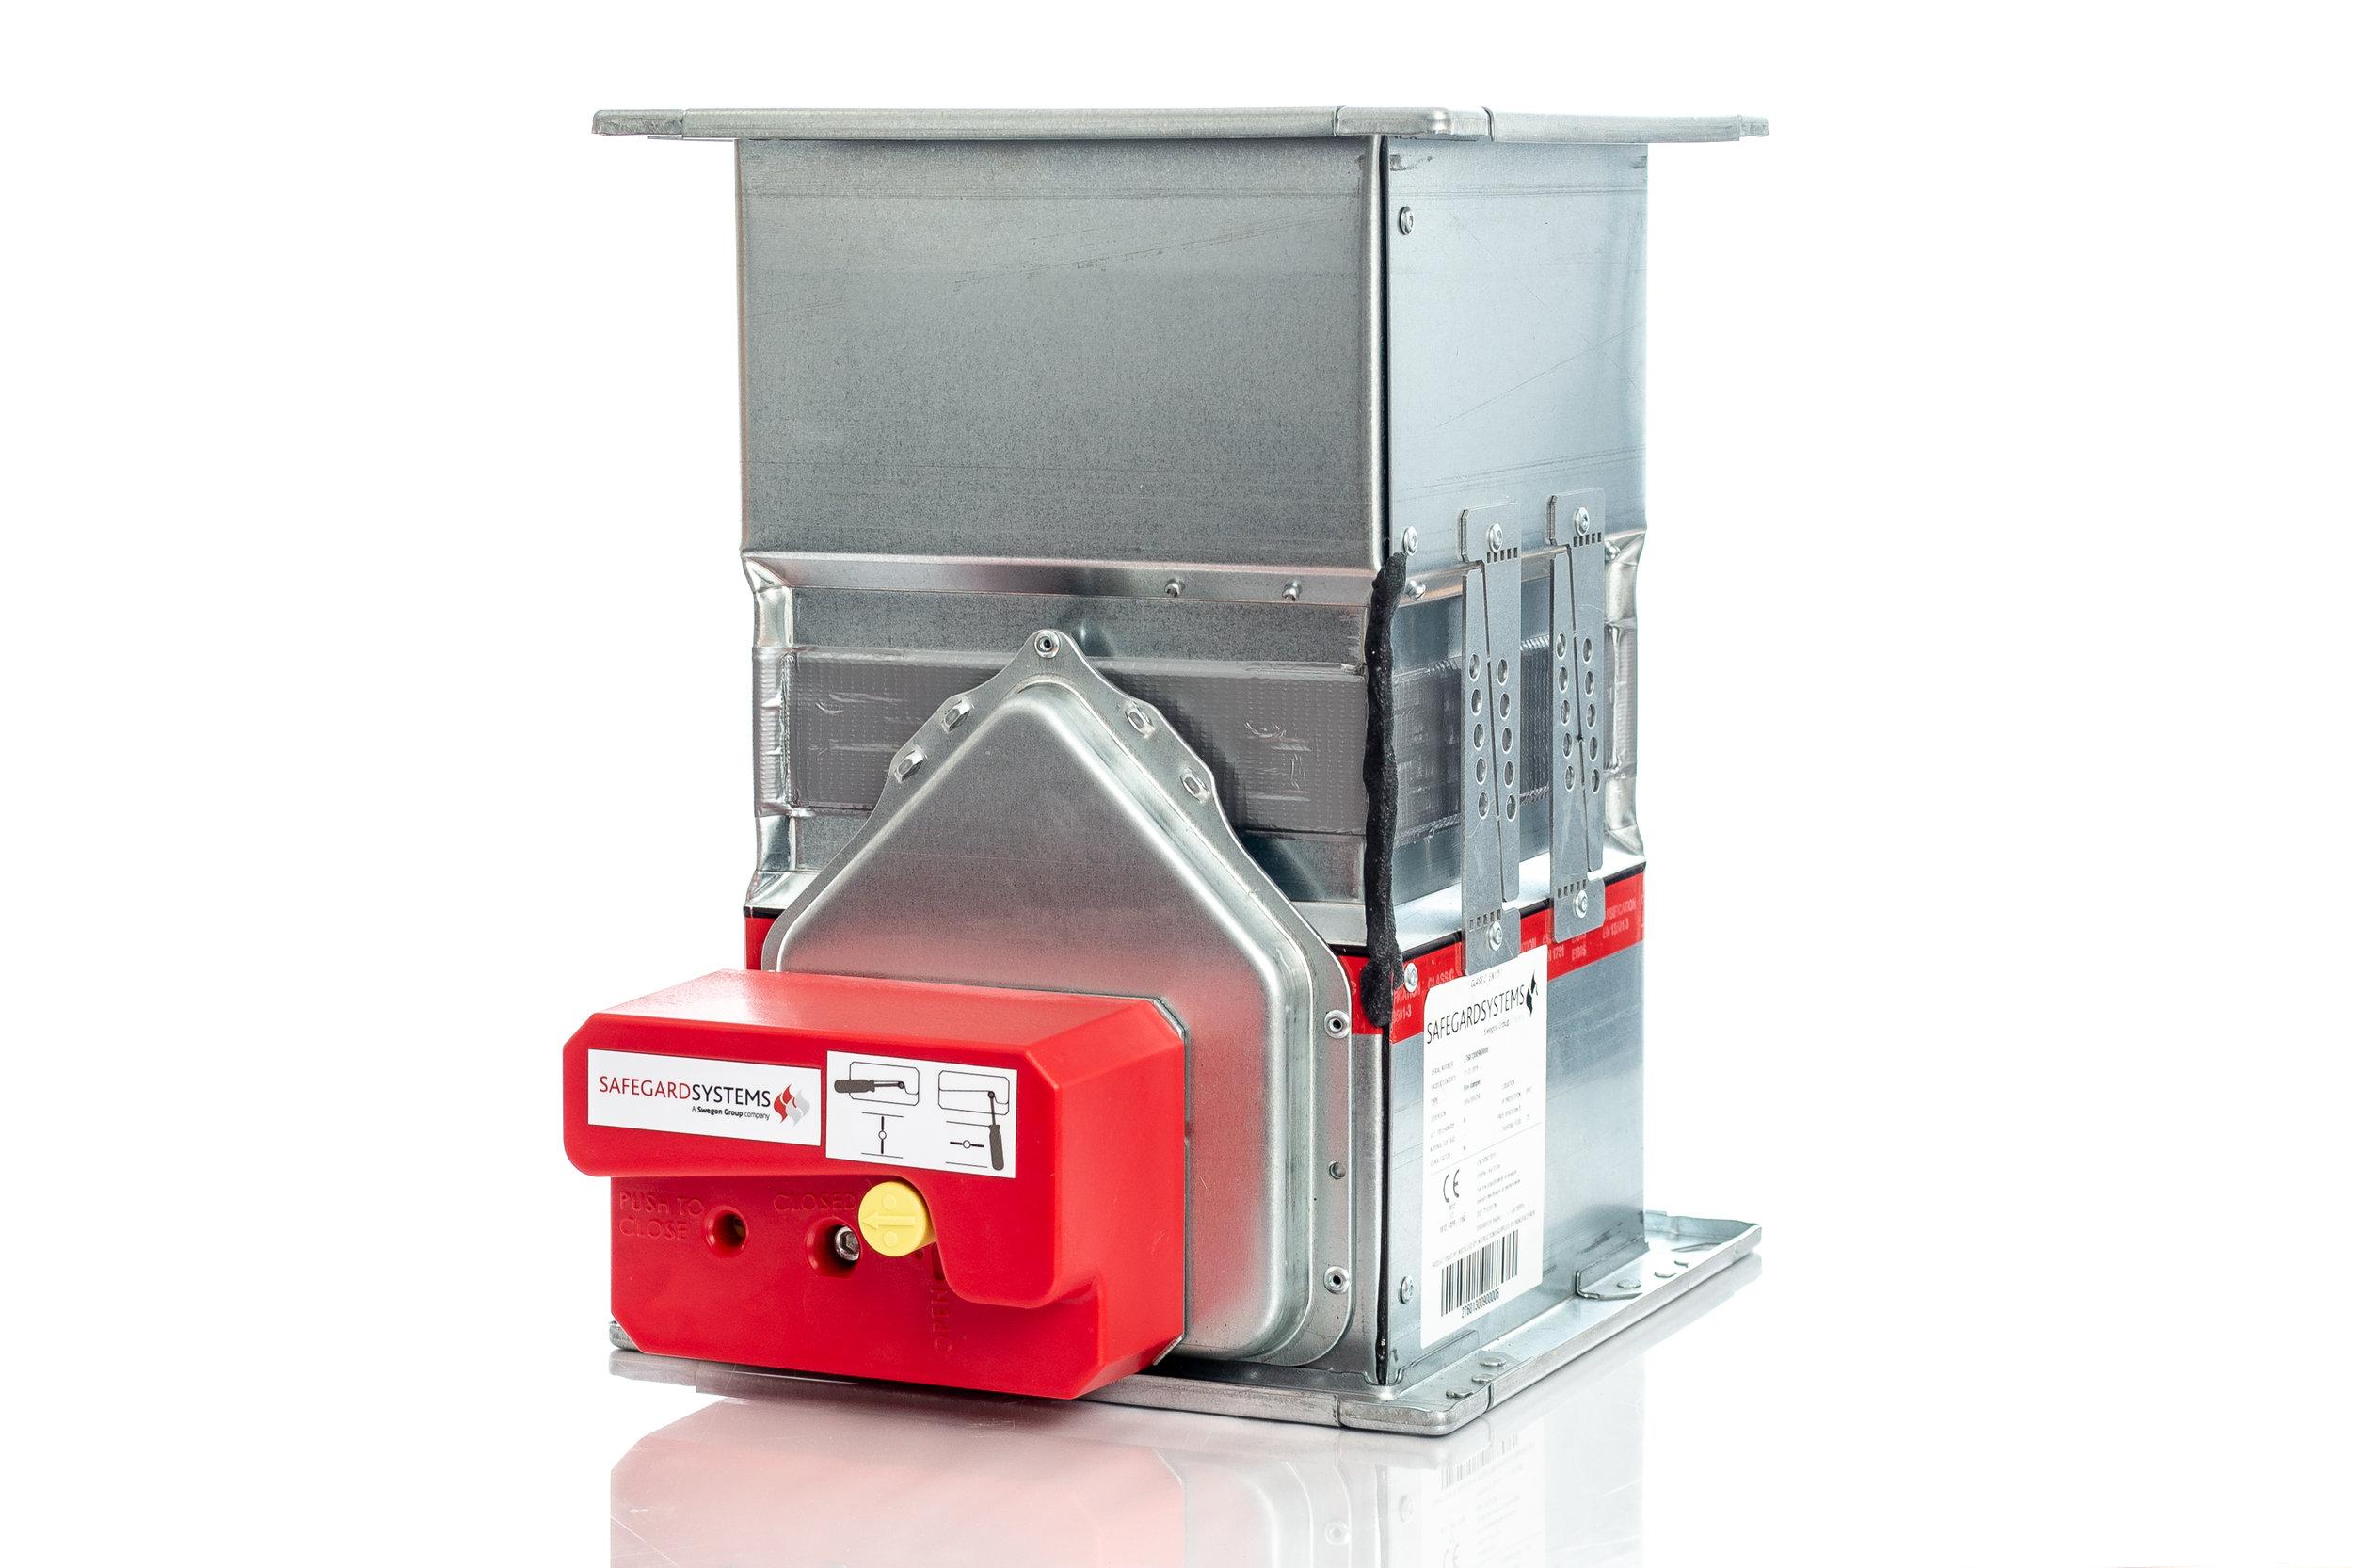 Safegard EIS Manual Fire Damper — Safegard Systems